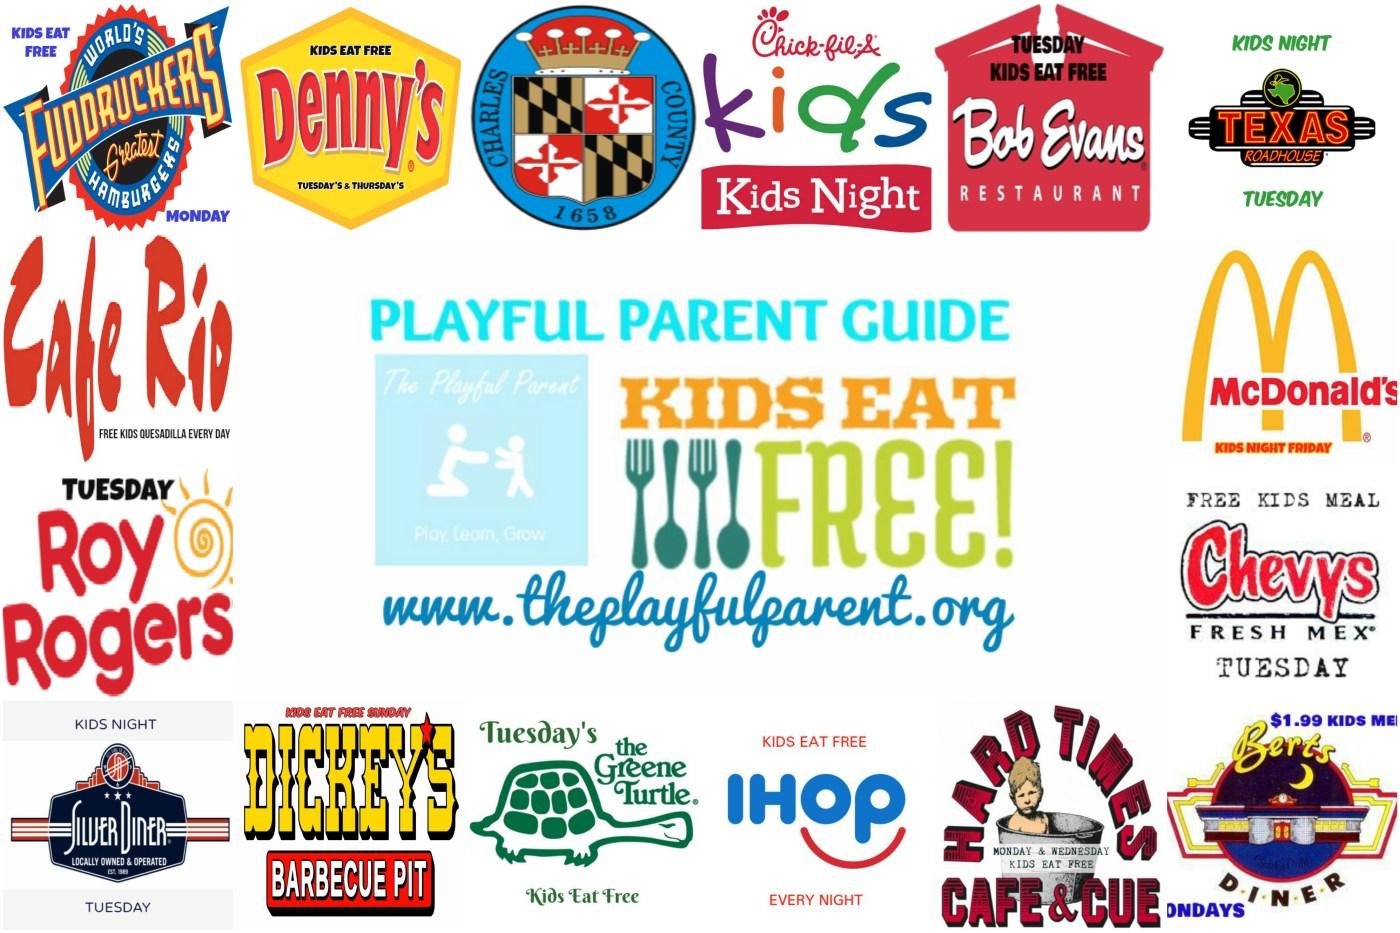 MARYLAND KIDS EAT FREE: PLAYFUL PARENT GUIDE